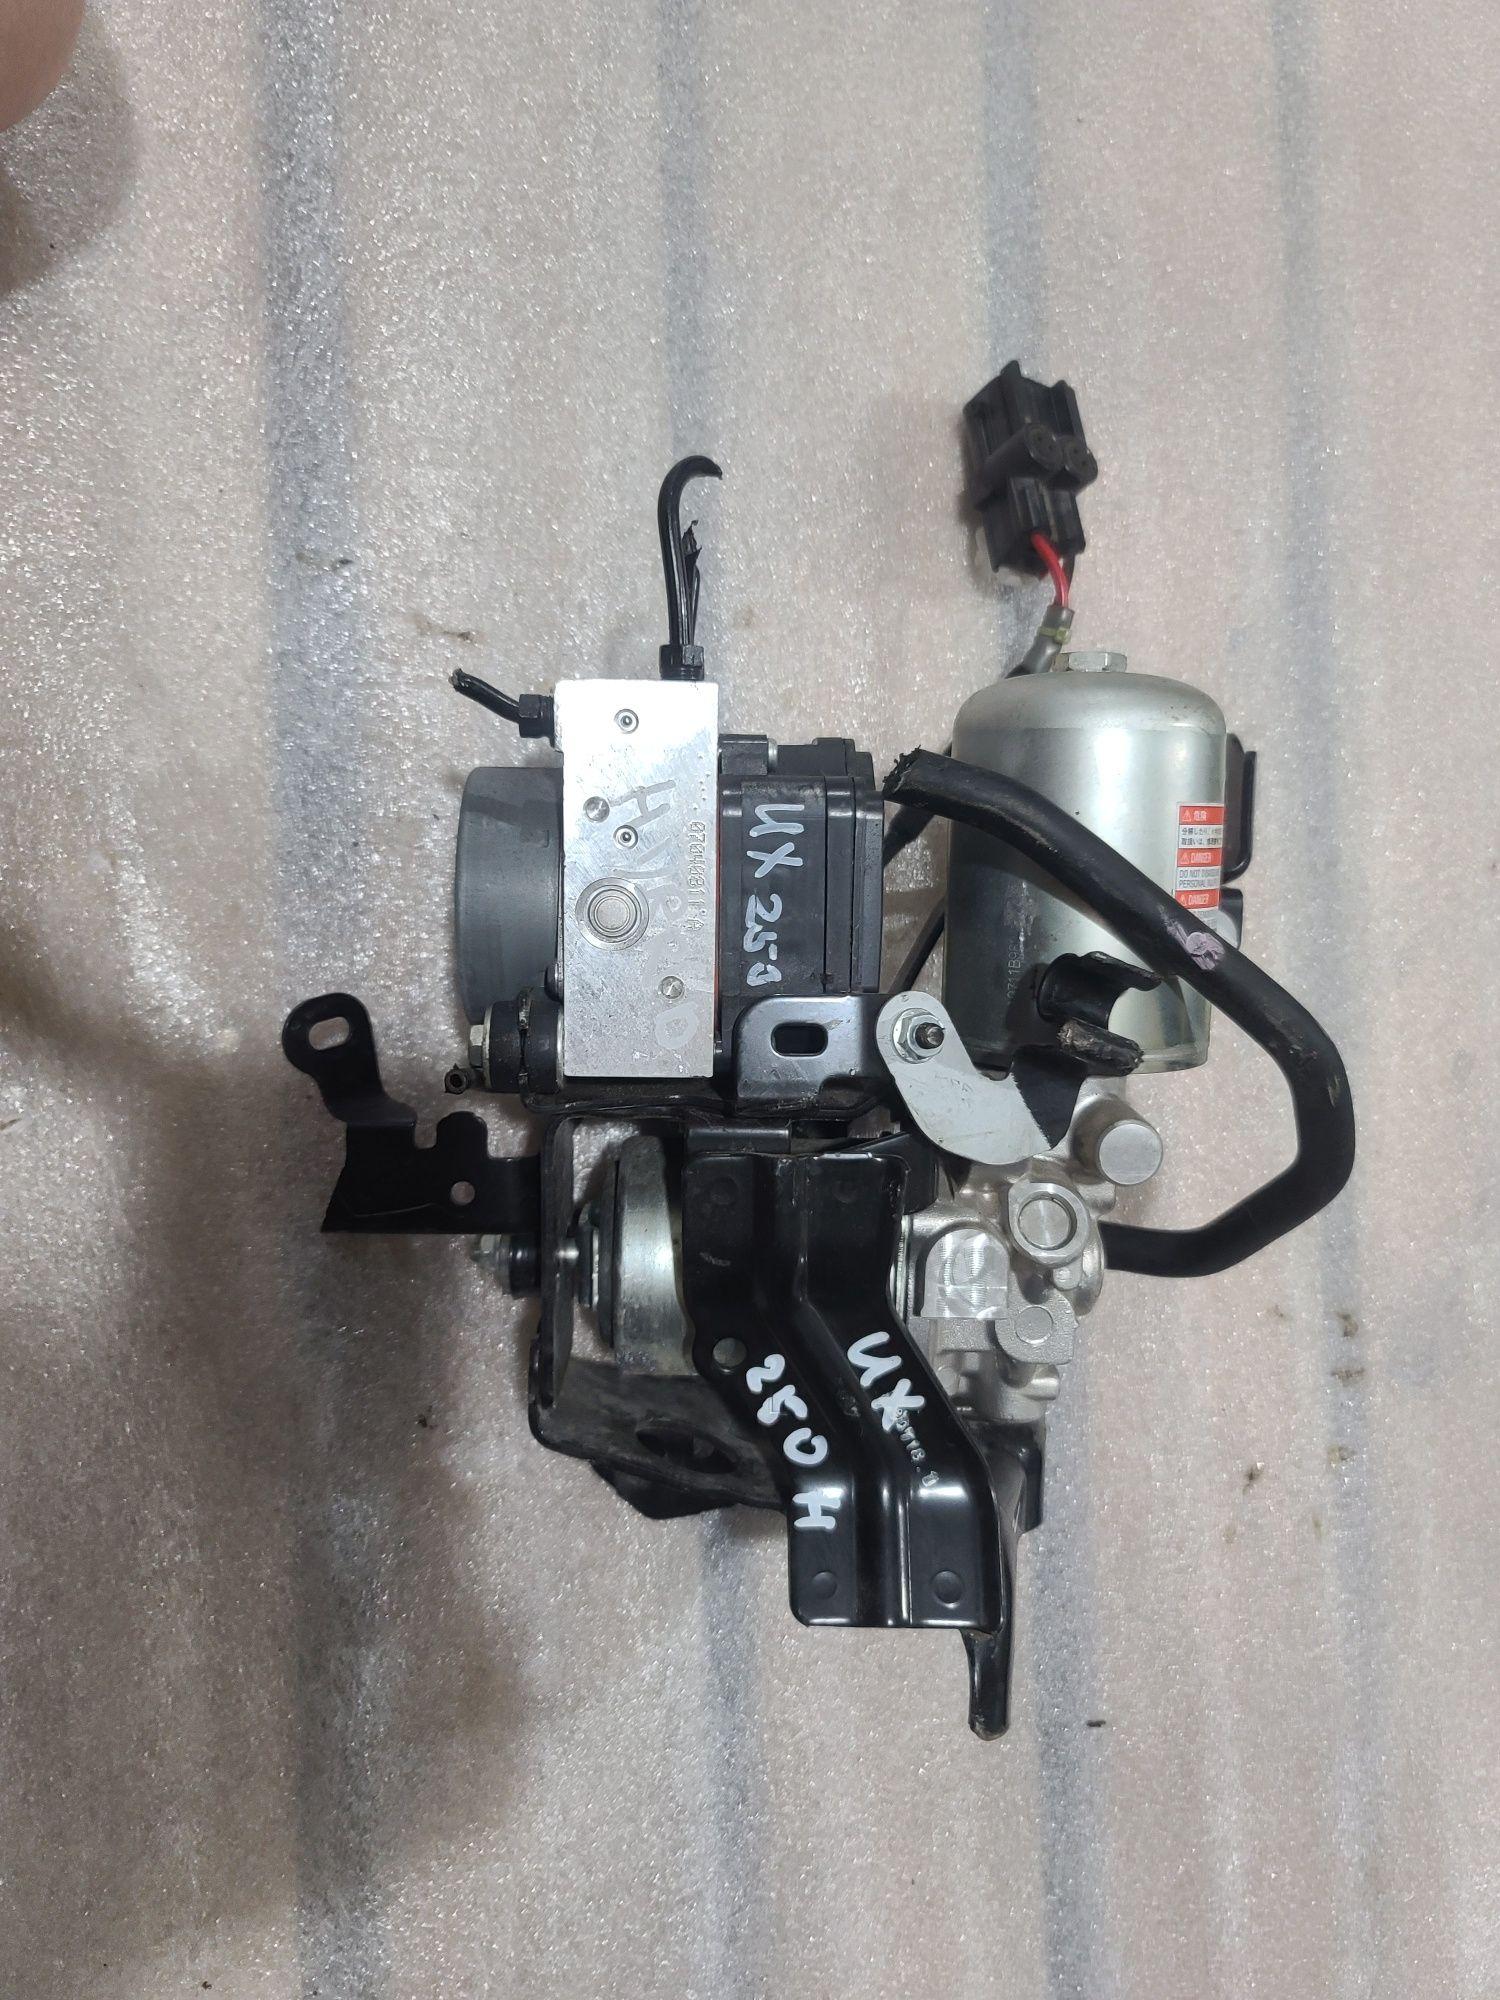 Блок ABS помпа АБС Lexus UX 250H гибрид лексус 44510-76010 ЗАПЧАСТИ